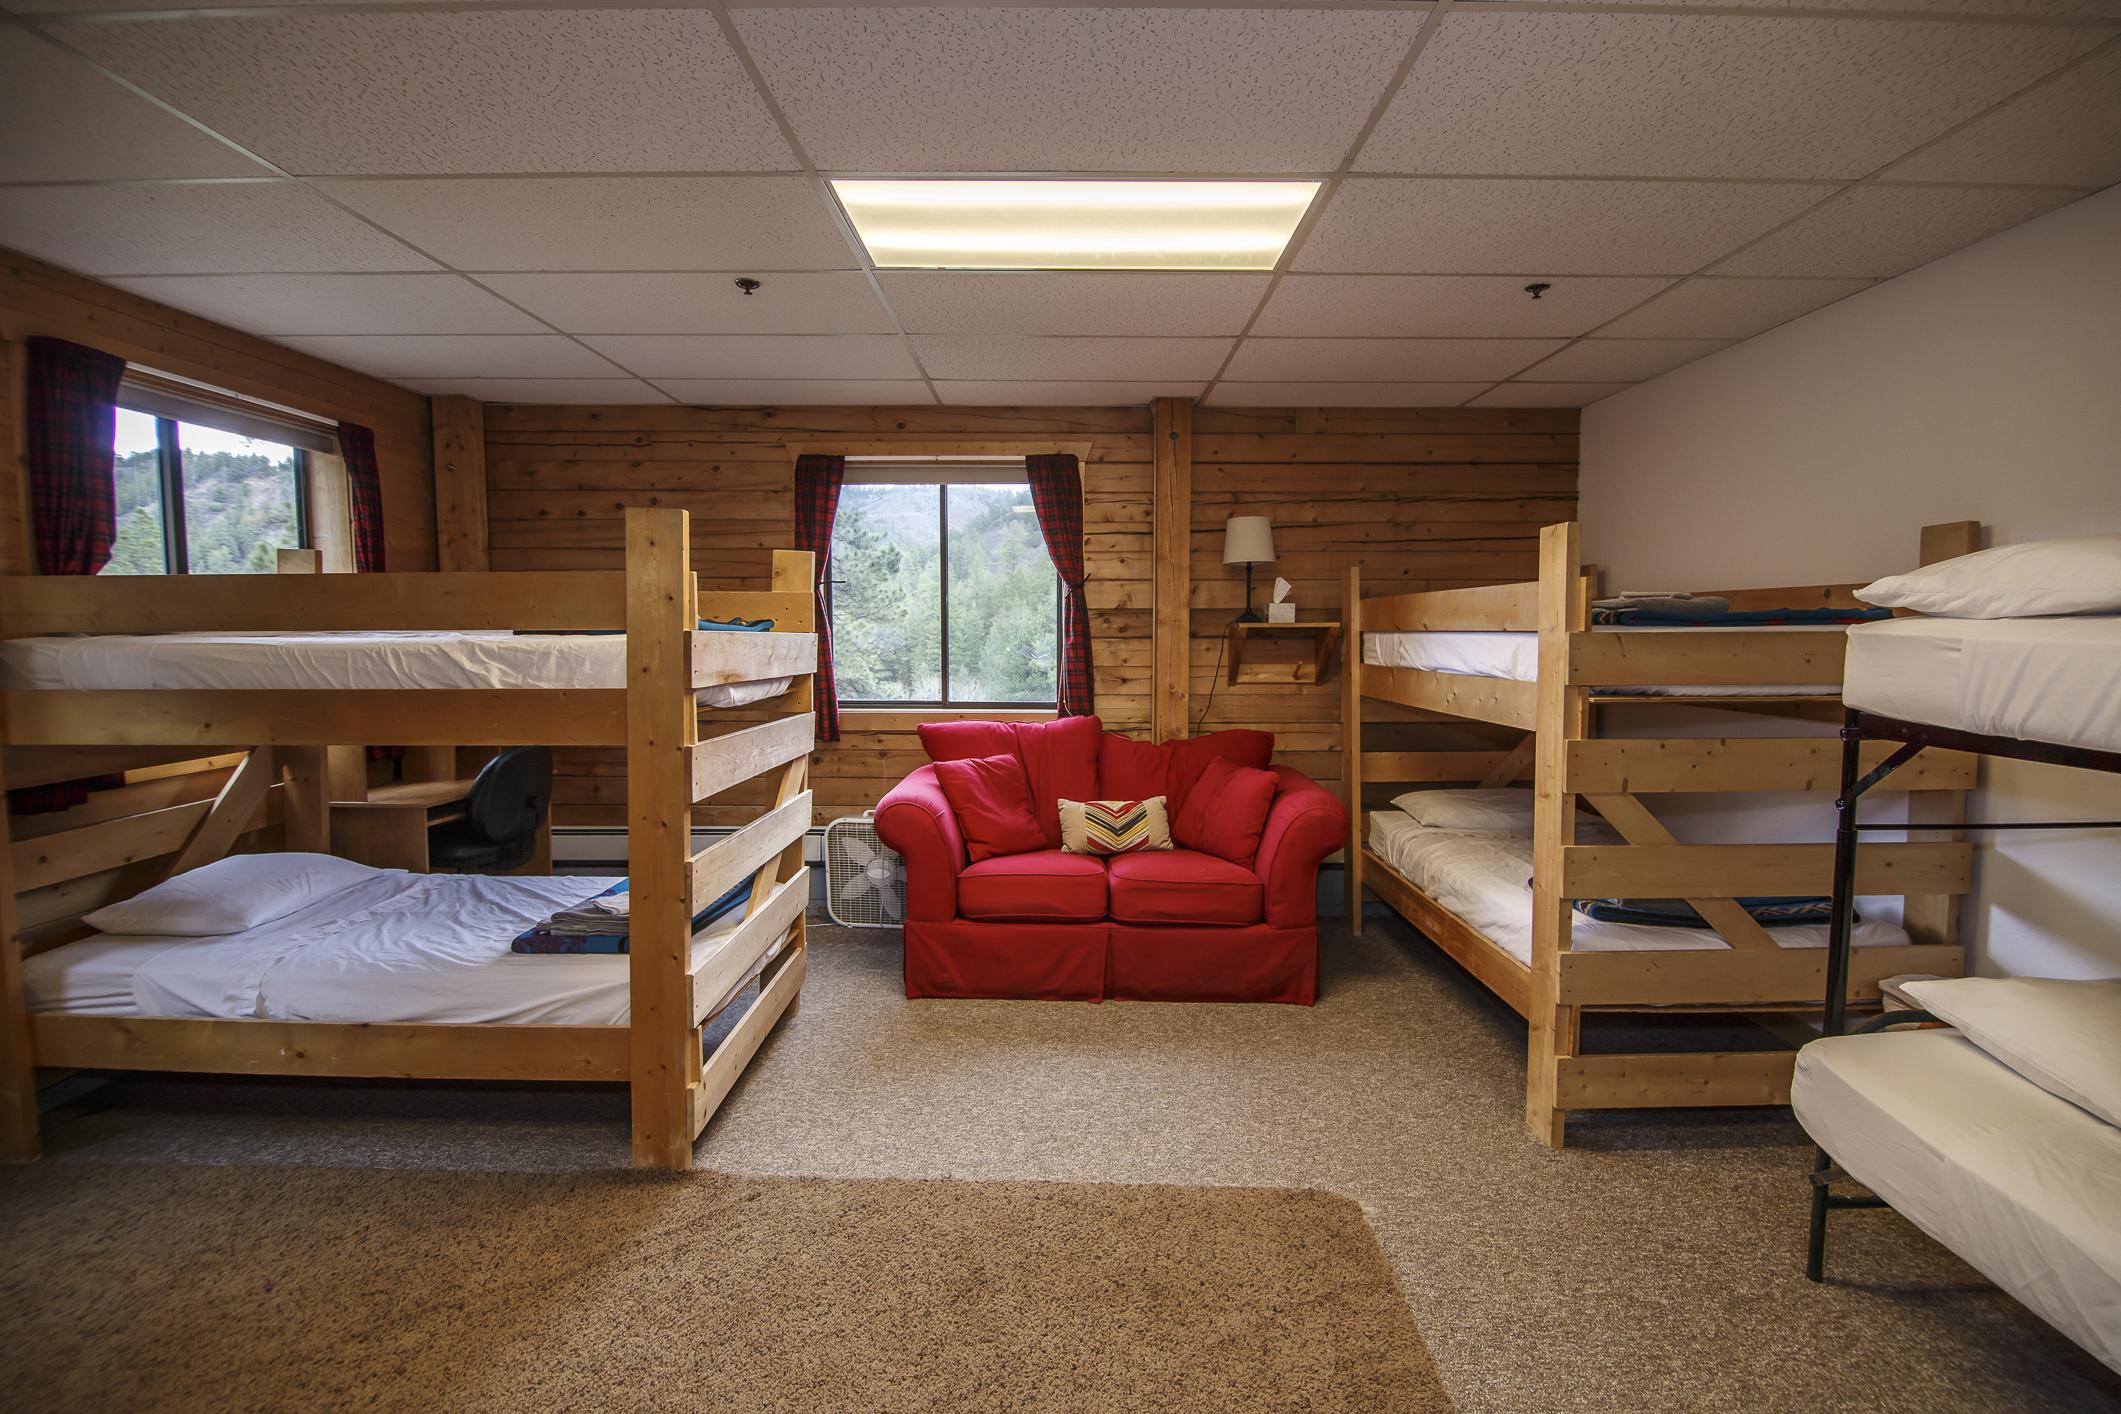 INT Main Lodge CREN--46.jpg